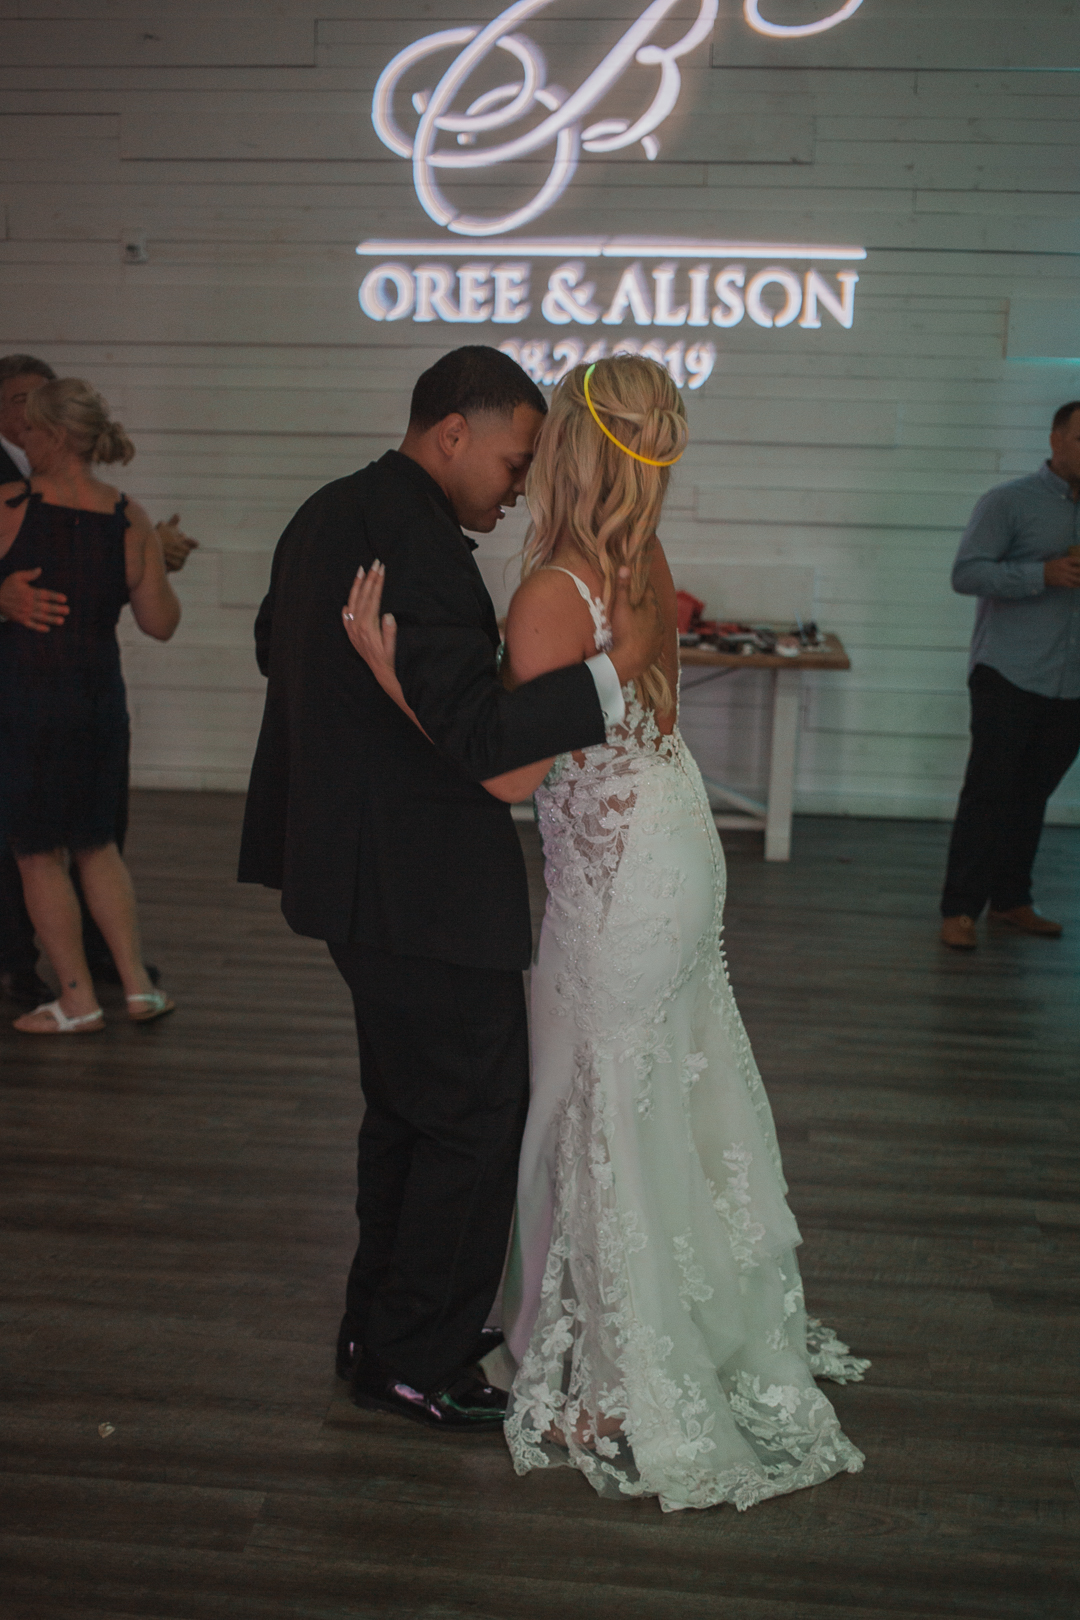 Aloson & Oree's Wedding (8-24-19) Edited6018.jpg